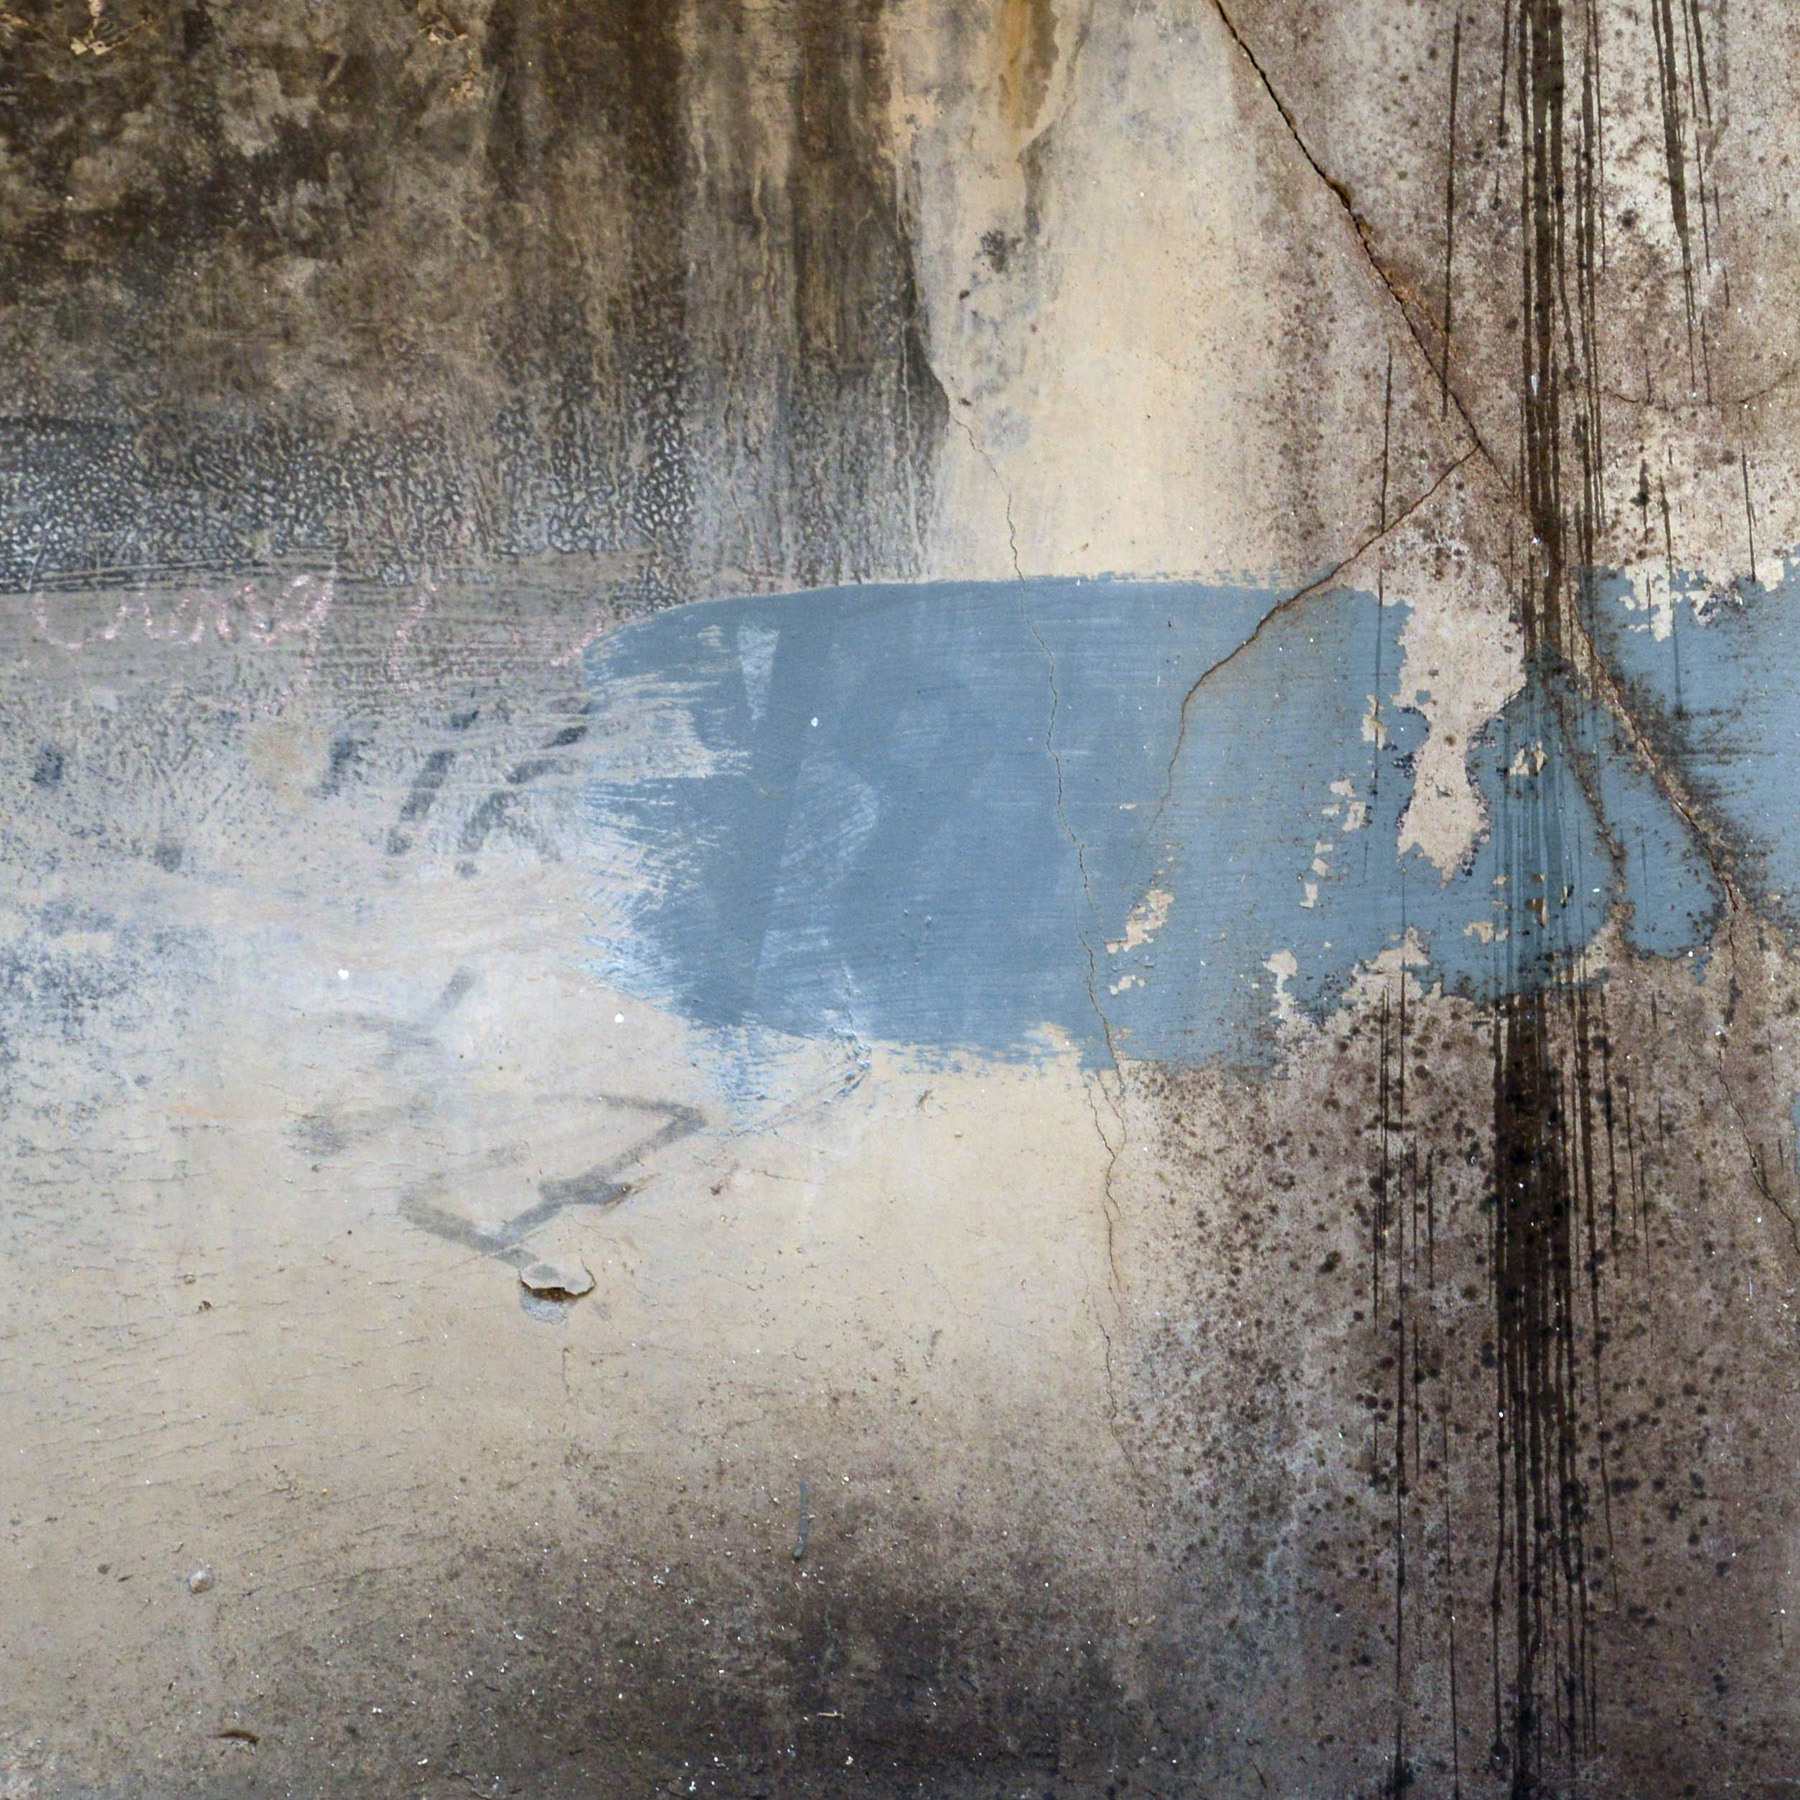 Karen_Burgess_Walls of the Gobi Desert_3.jpg